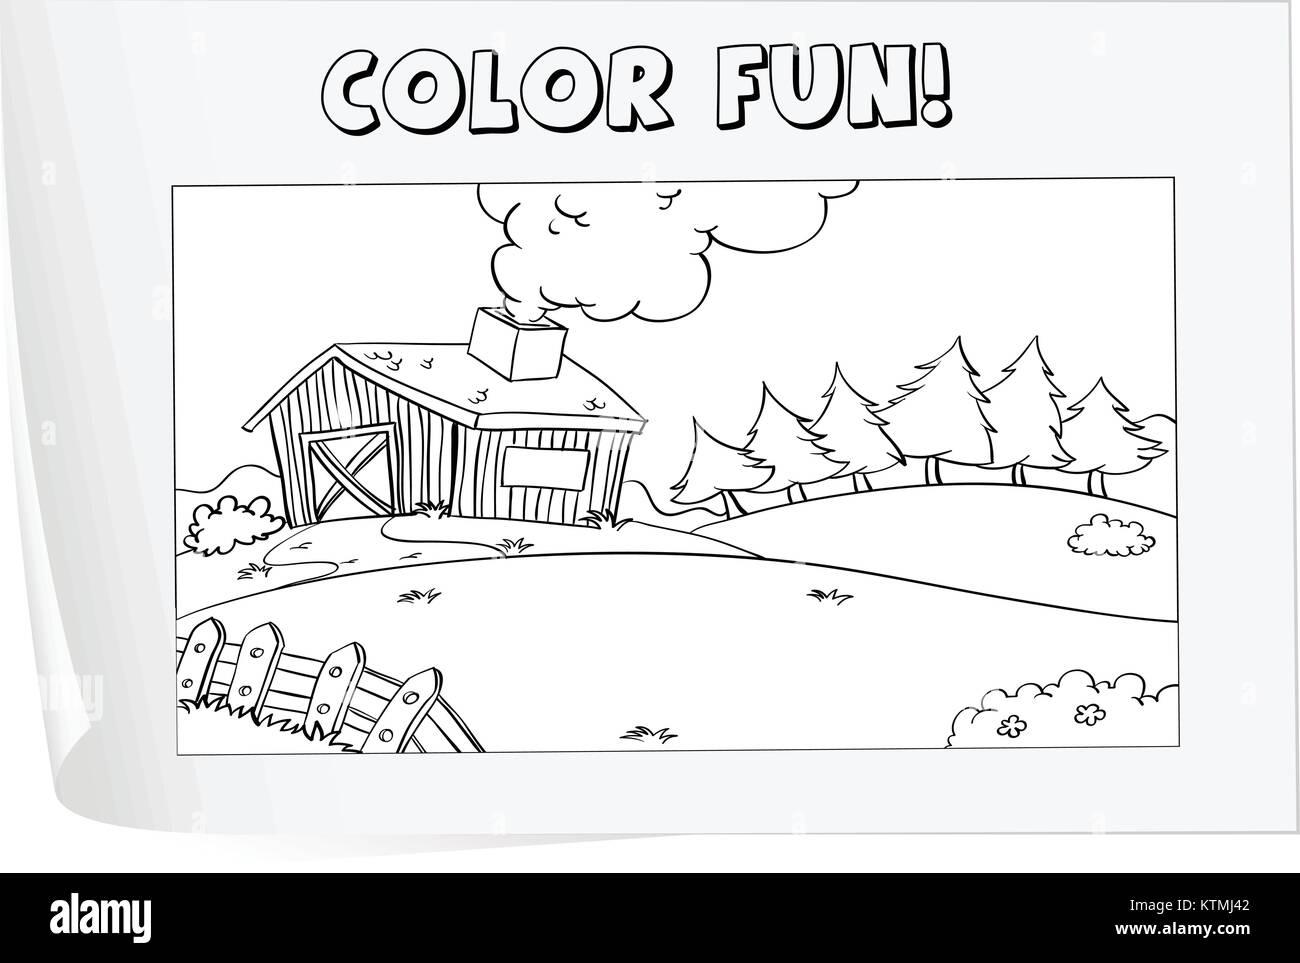 Abbildung einer Färbung Arbeitsblatt (Bauernhof Vektor Abbildung ...